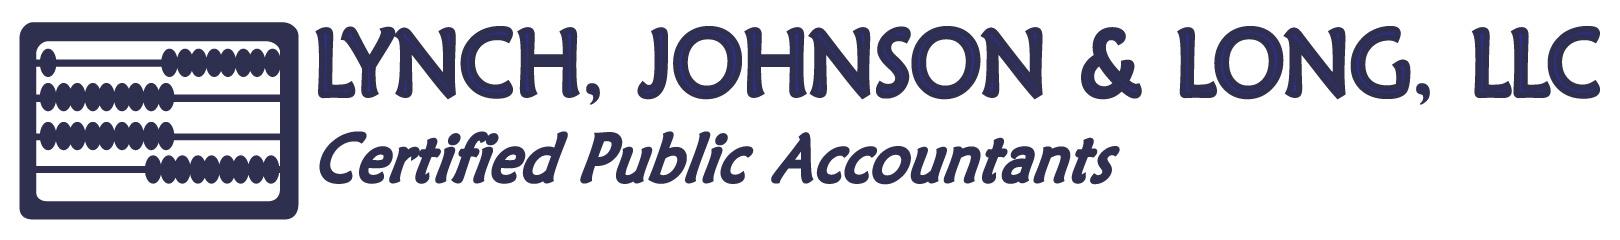 Fort Pierce, FL Accounting Firm | Personal Financial Planning Page | Lynch, Johnson & Long, LLC